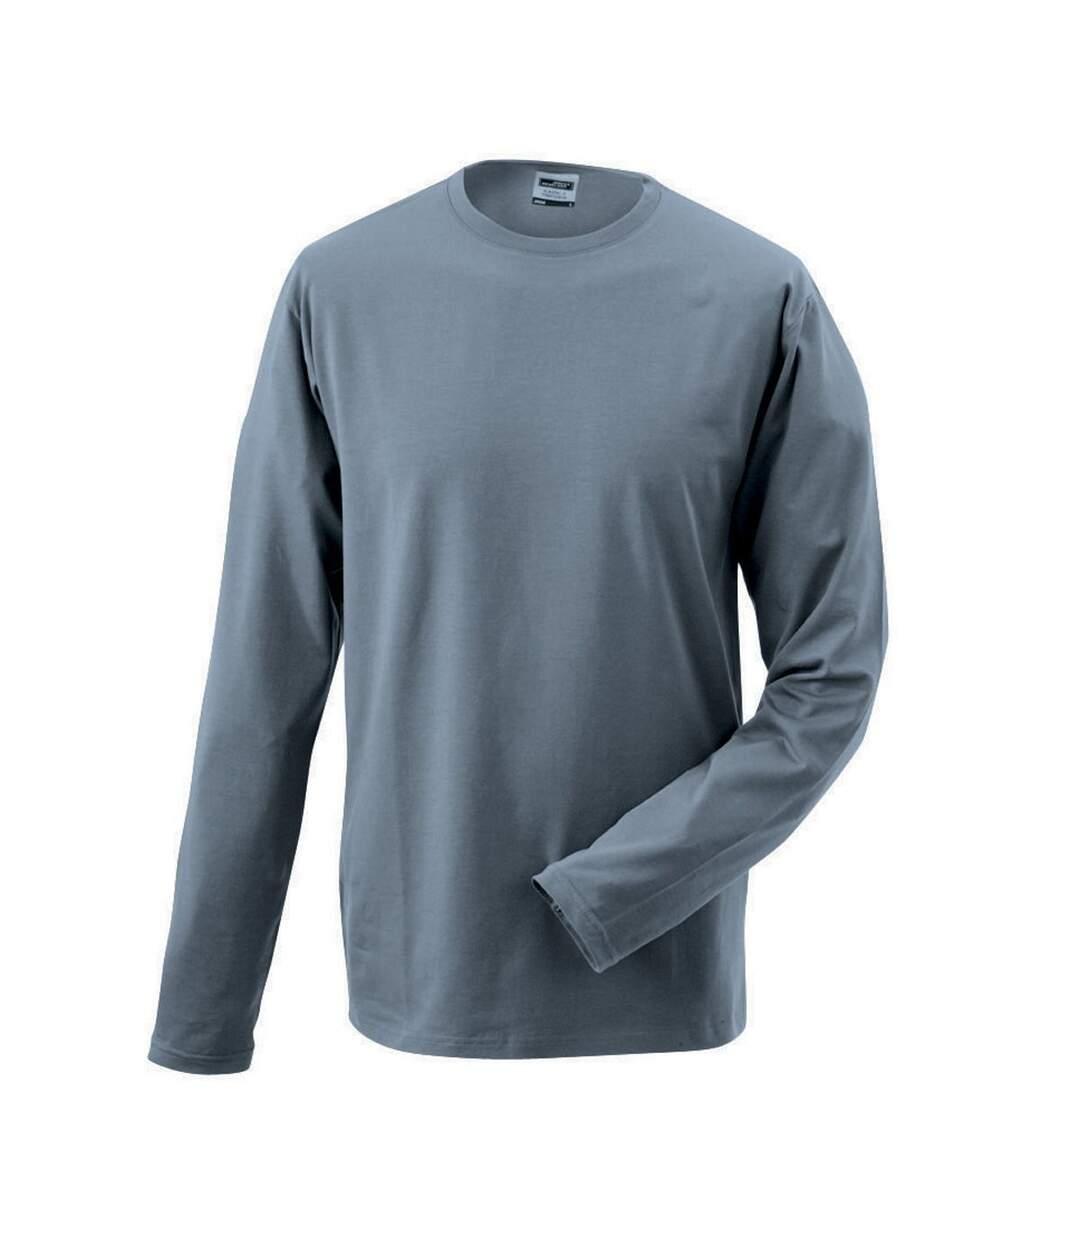 T-shirt stretch homme manches longues - JN056 - gris moyen